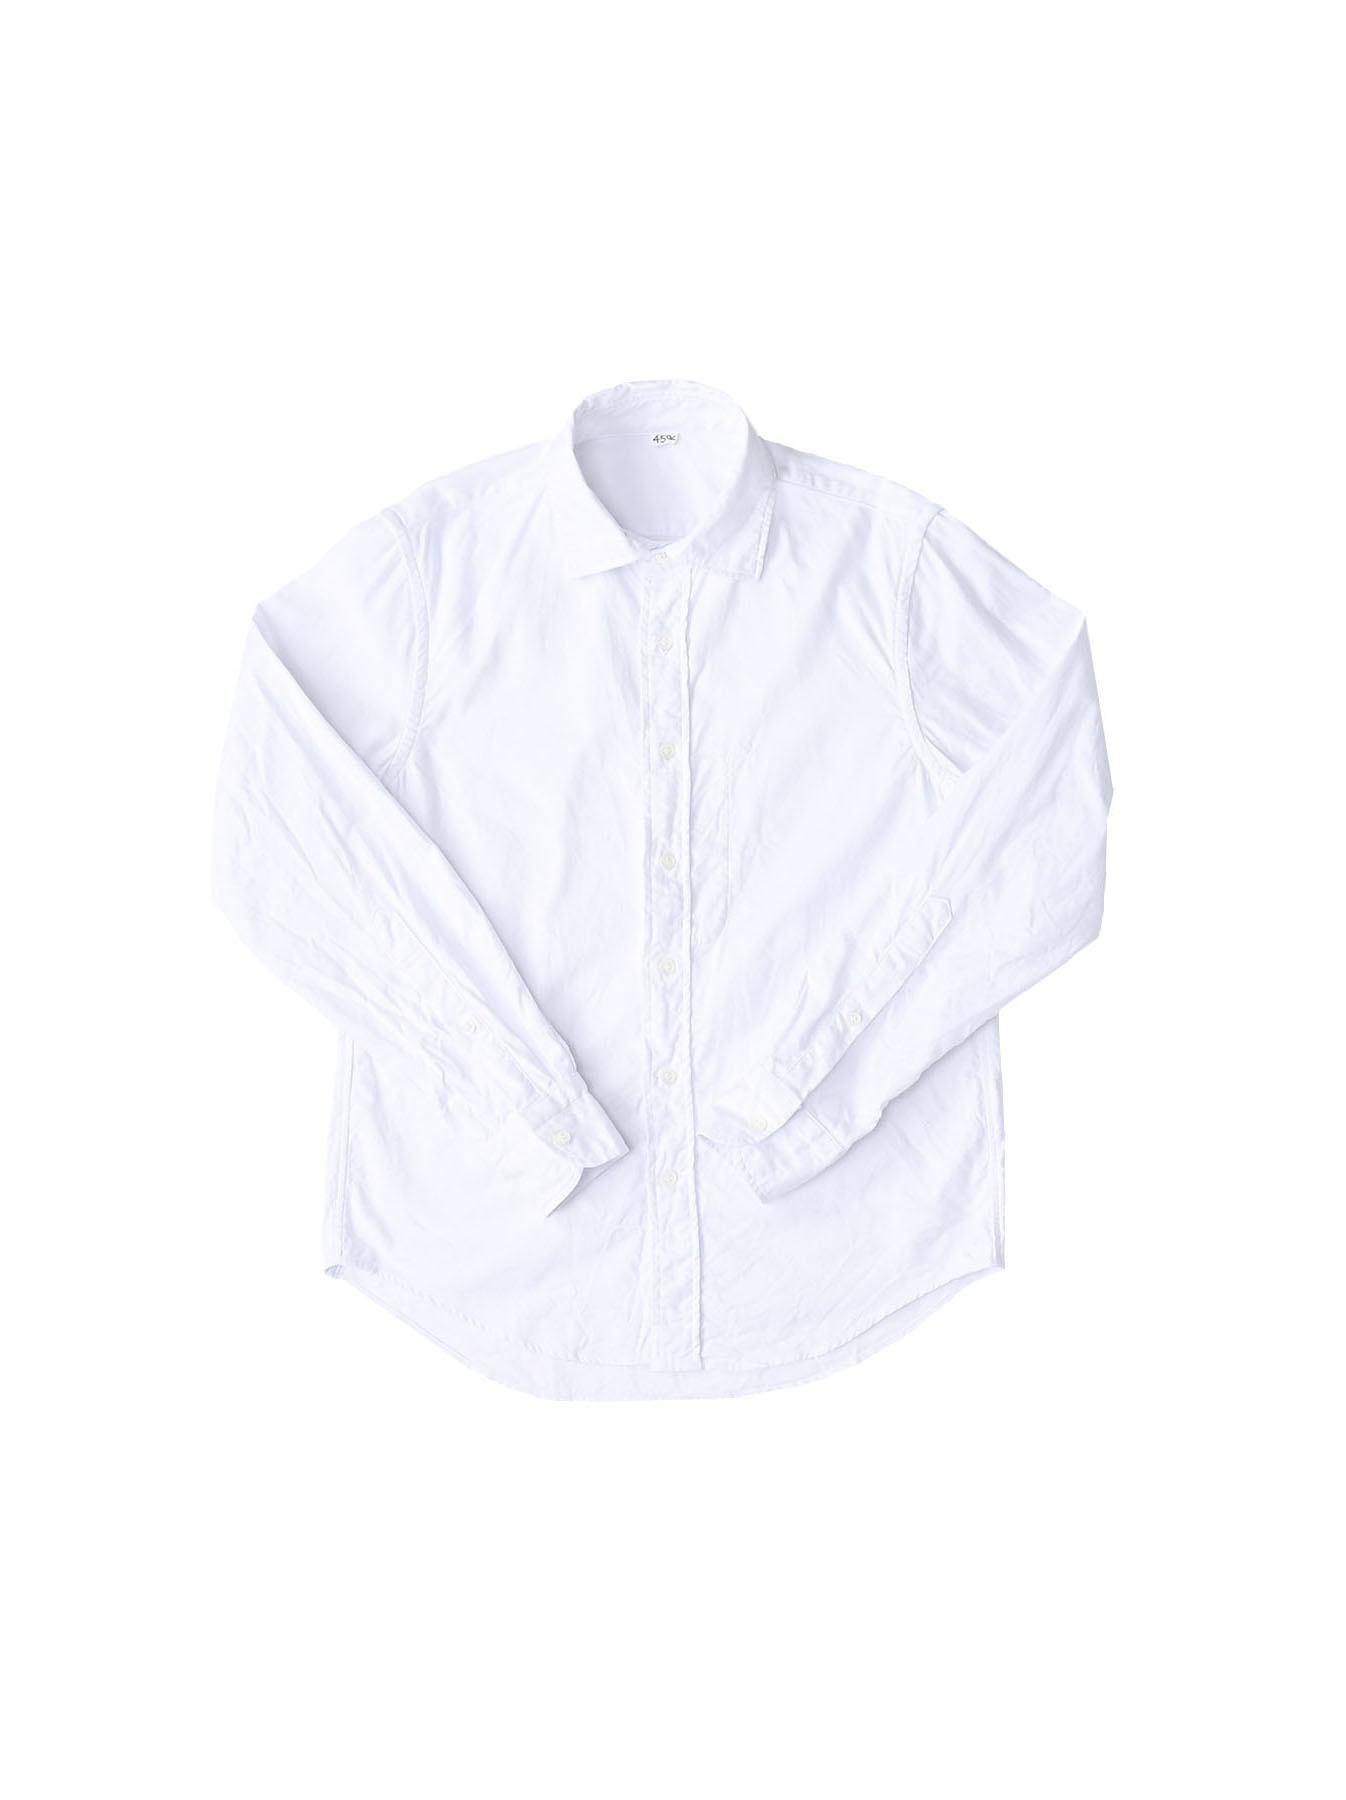 Zimbabwe Oxford 908 Regular Shirt-1